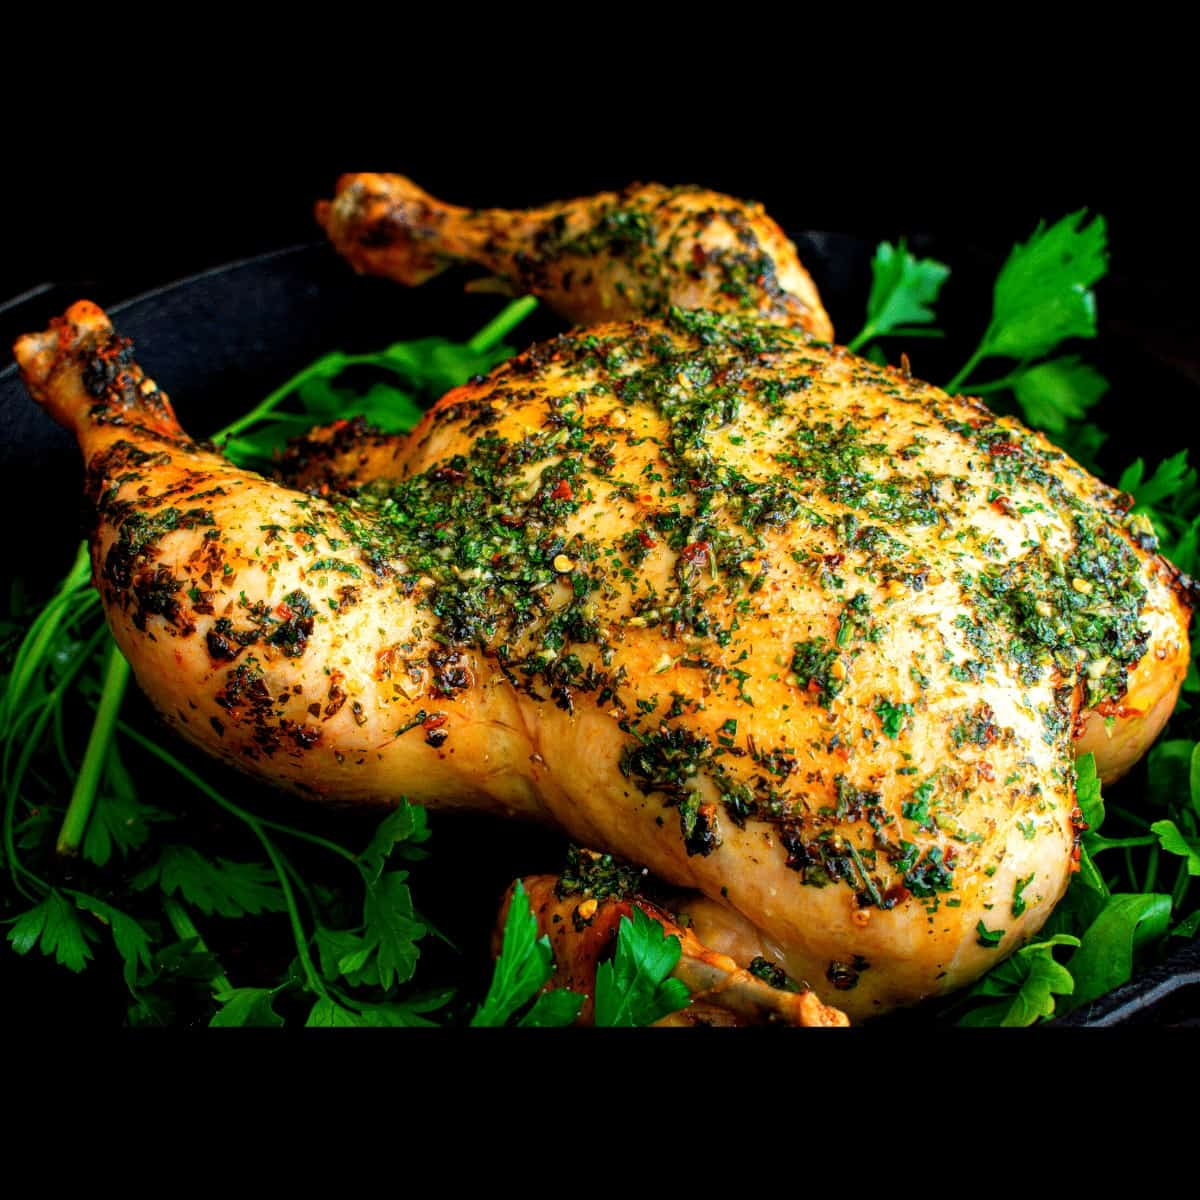 Roasted Chimichurri chicken FI